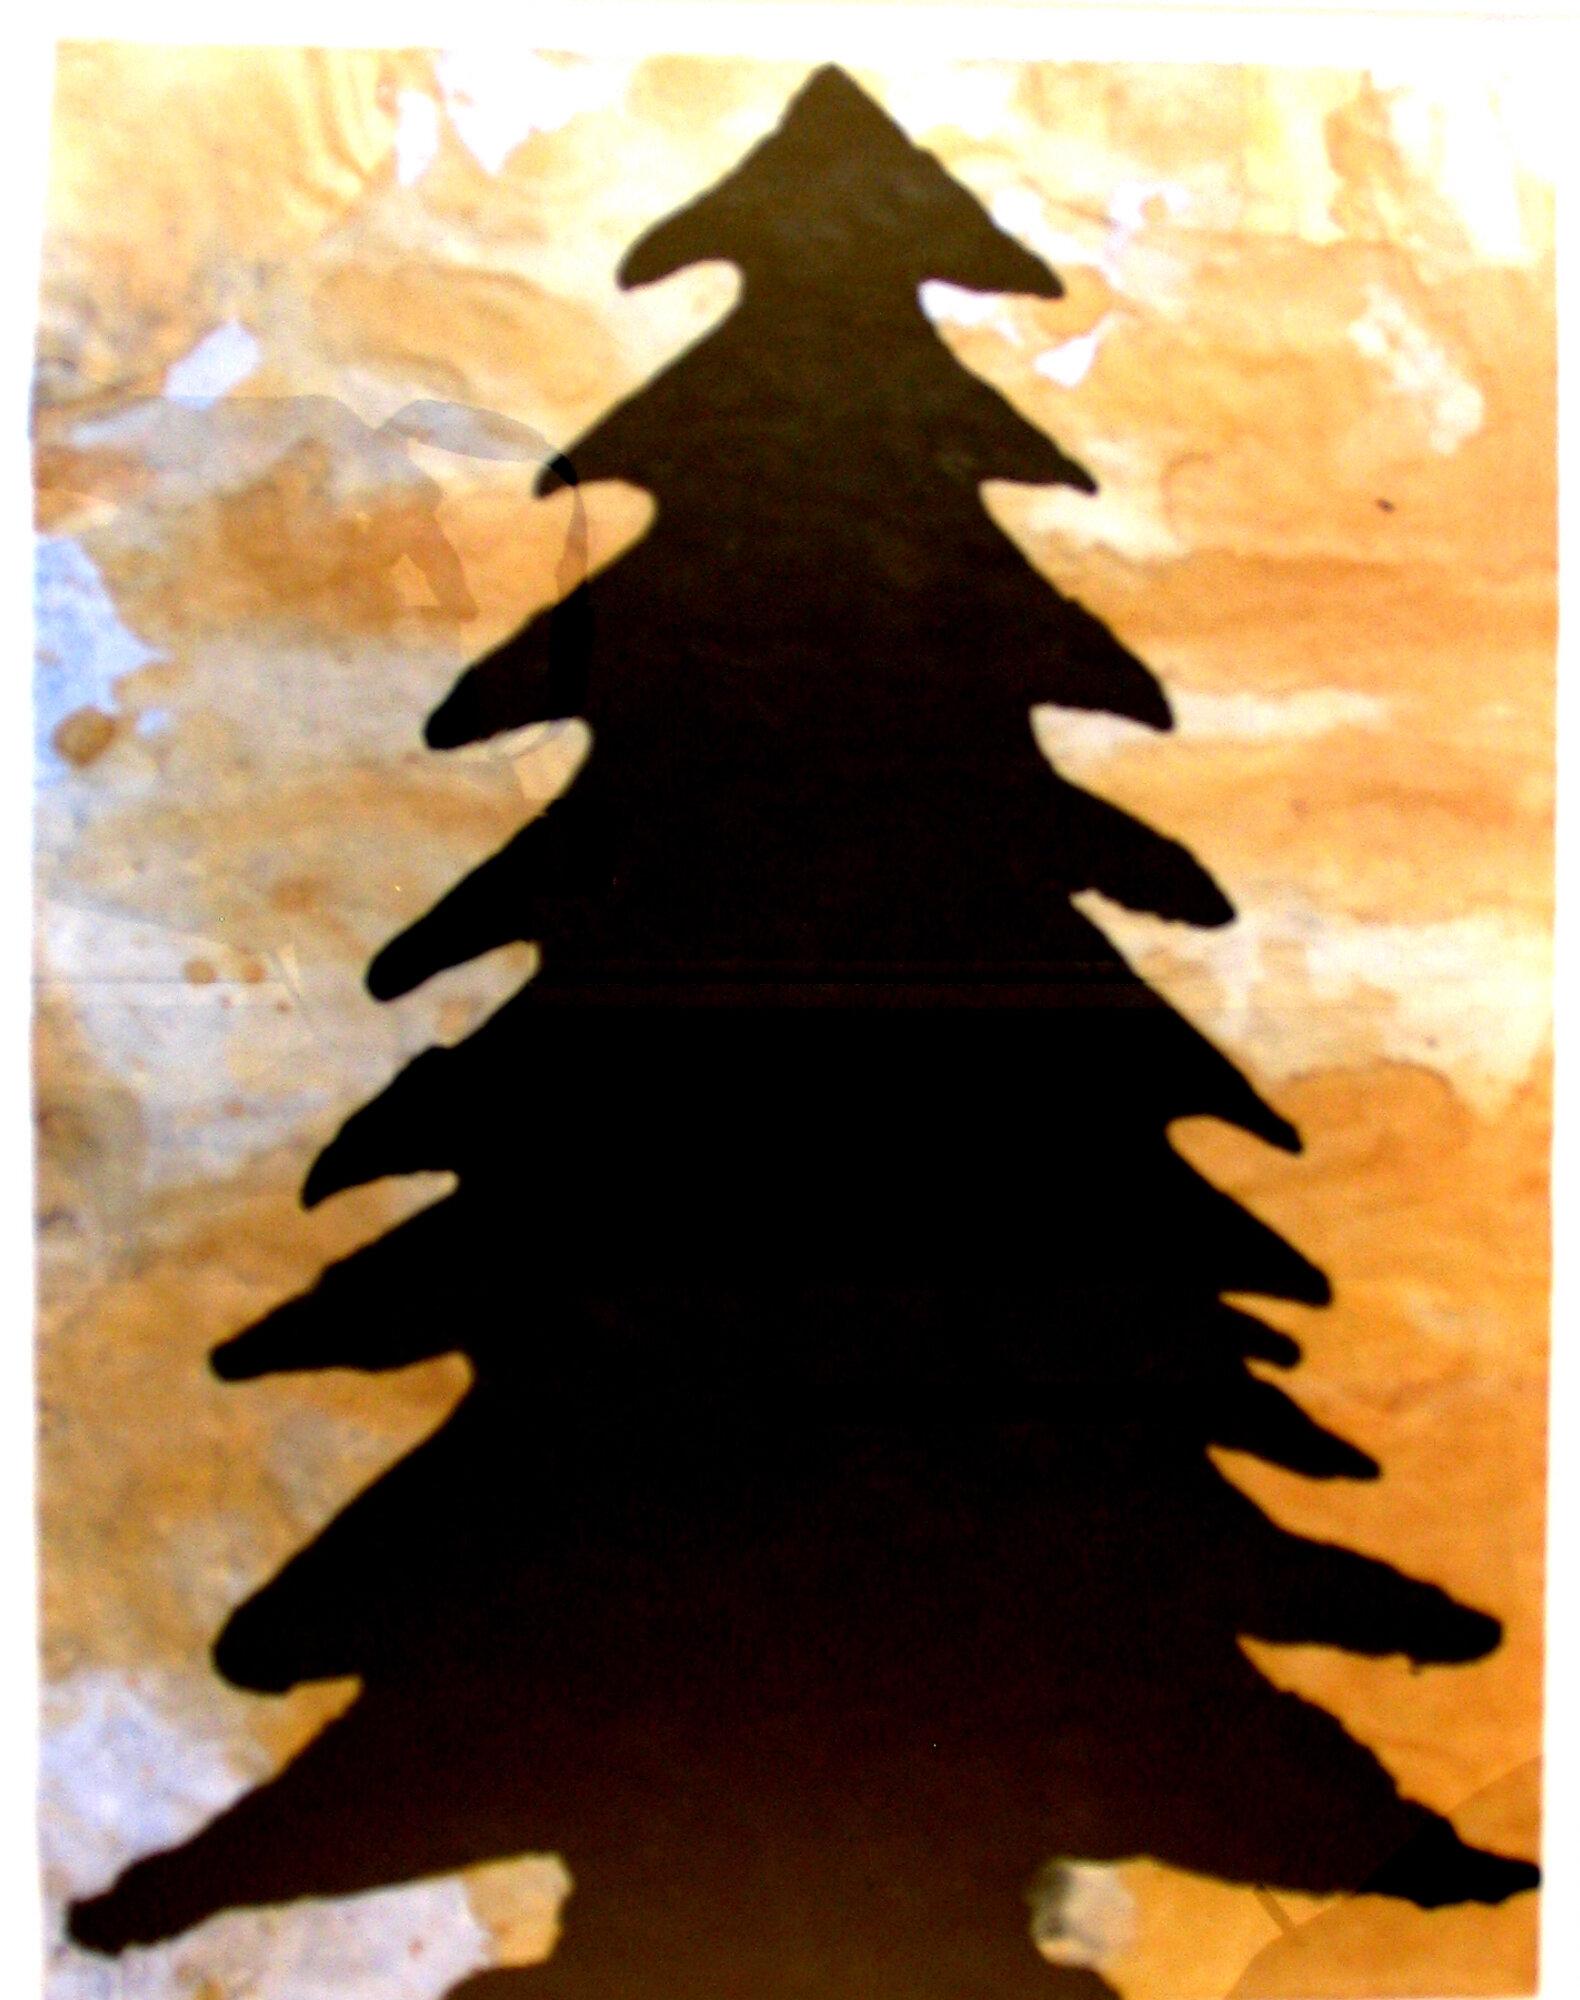 Tree by Donald Baechler